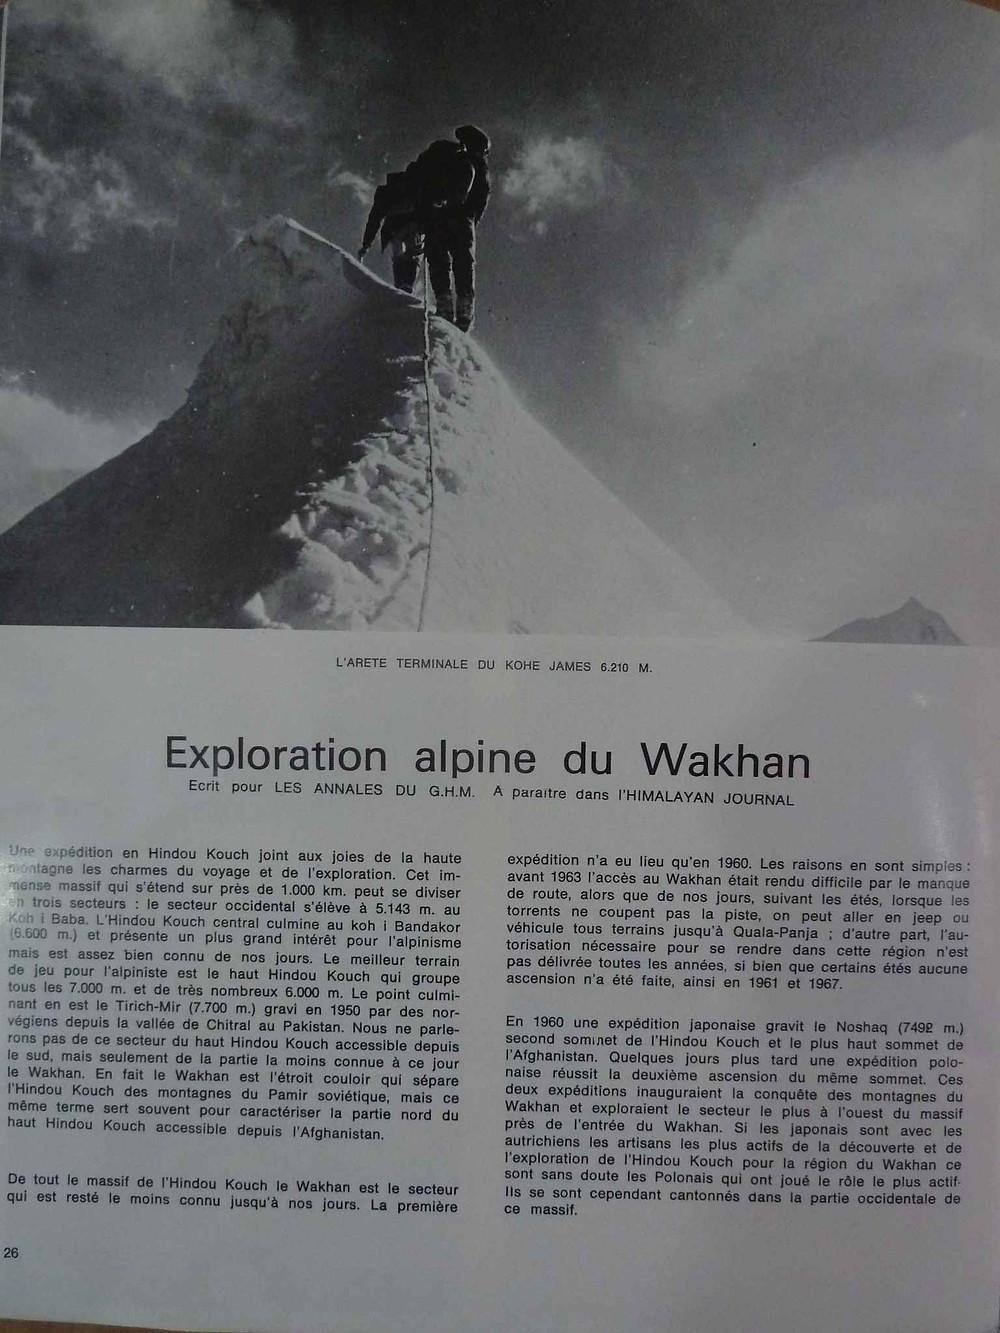 Exploration alpine du Wakhan, alpinisme en Afghanistan